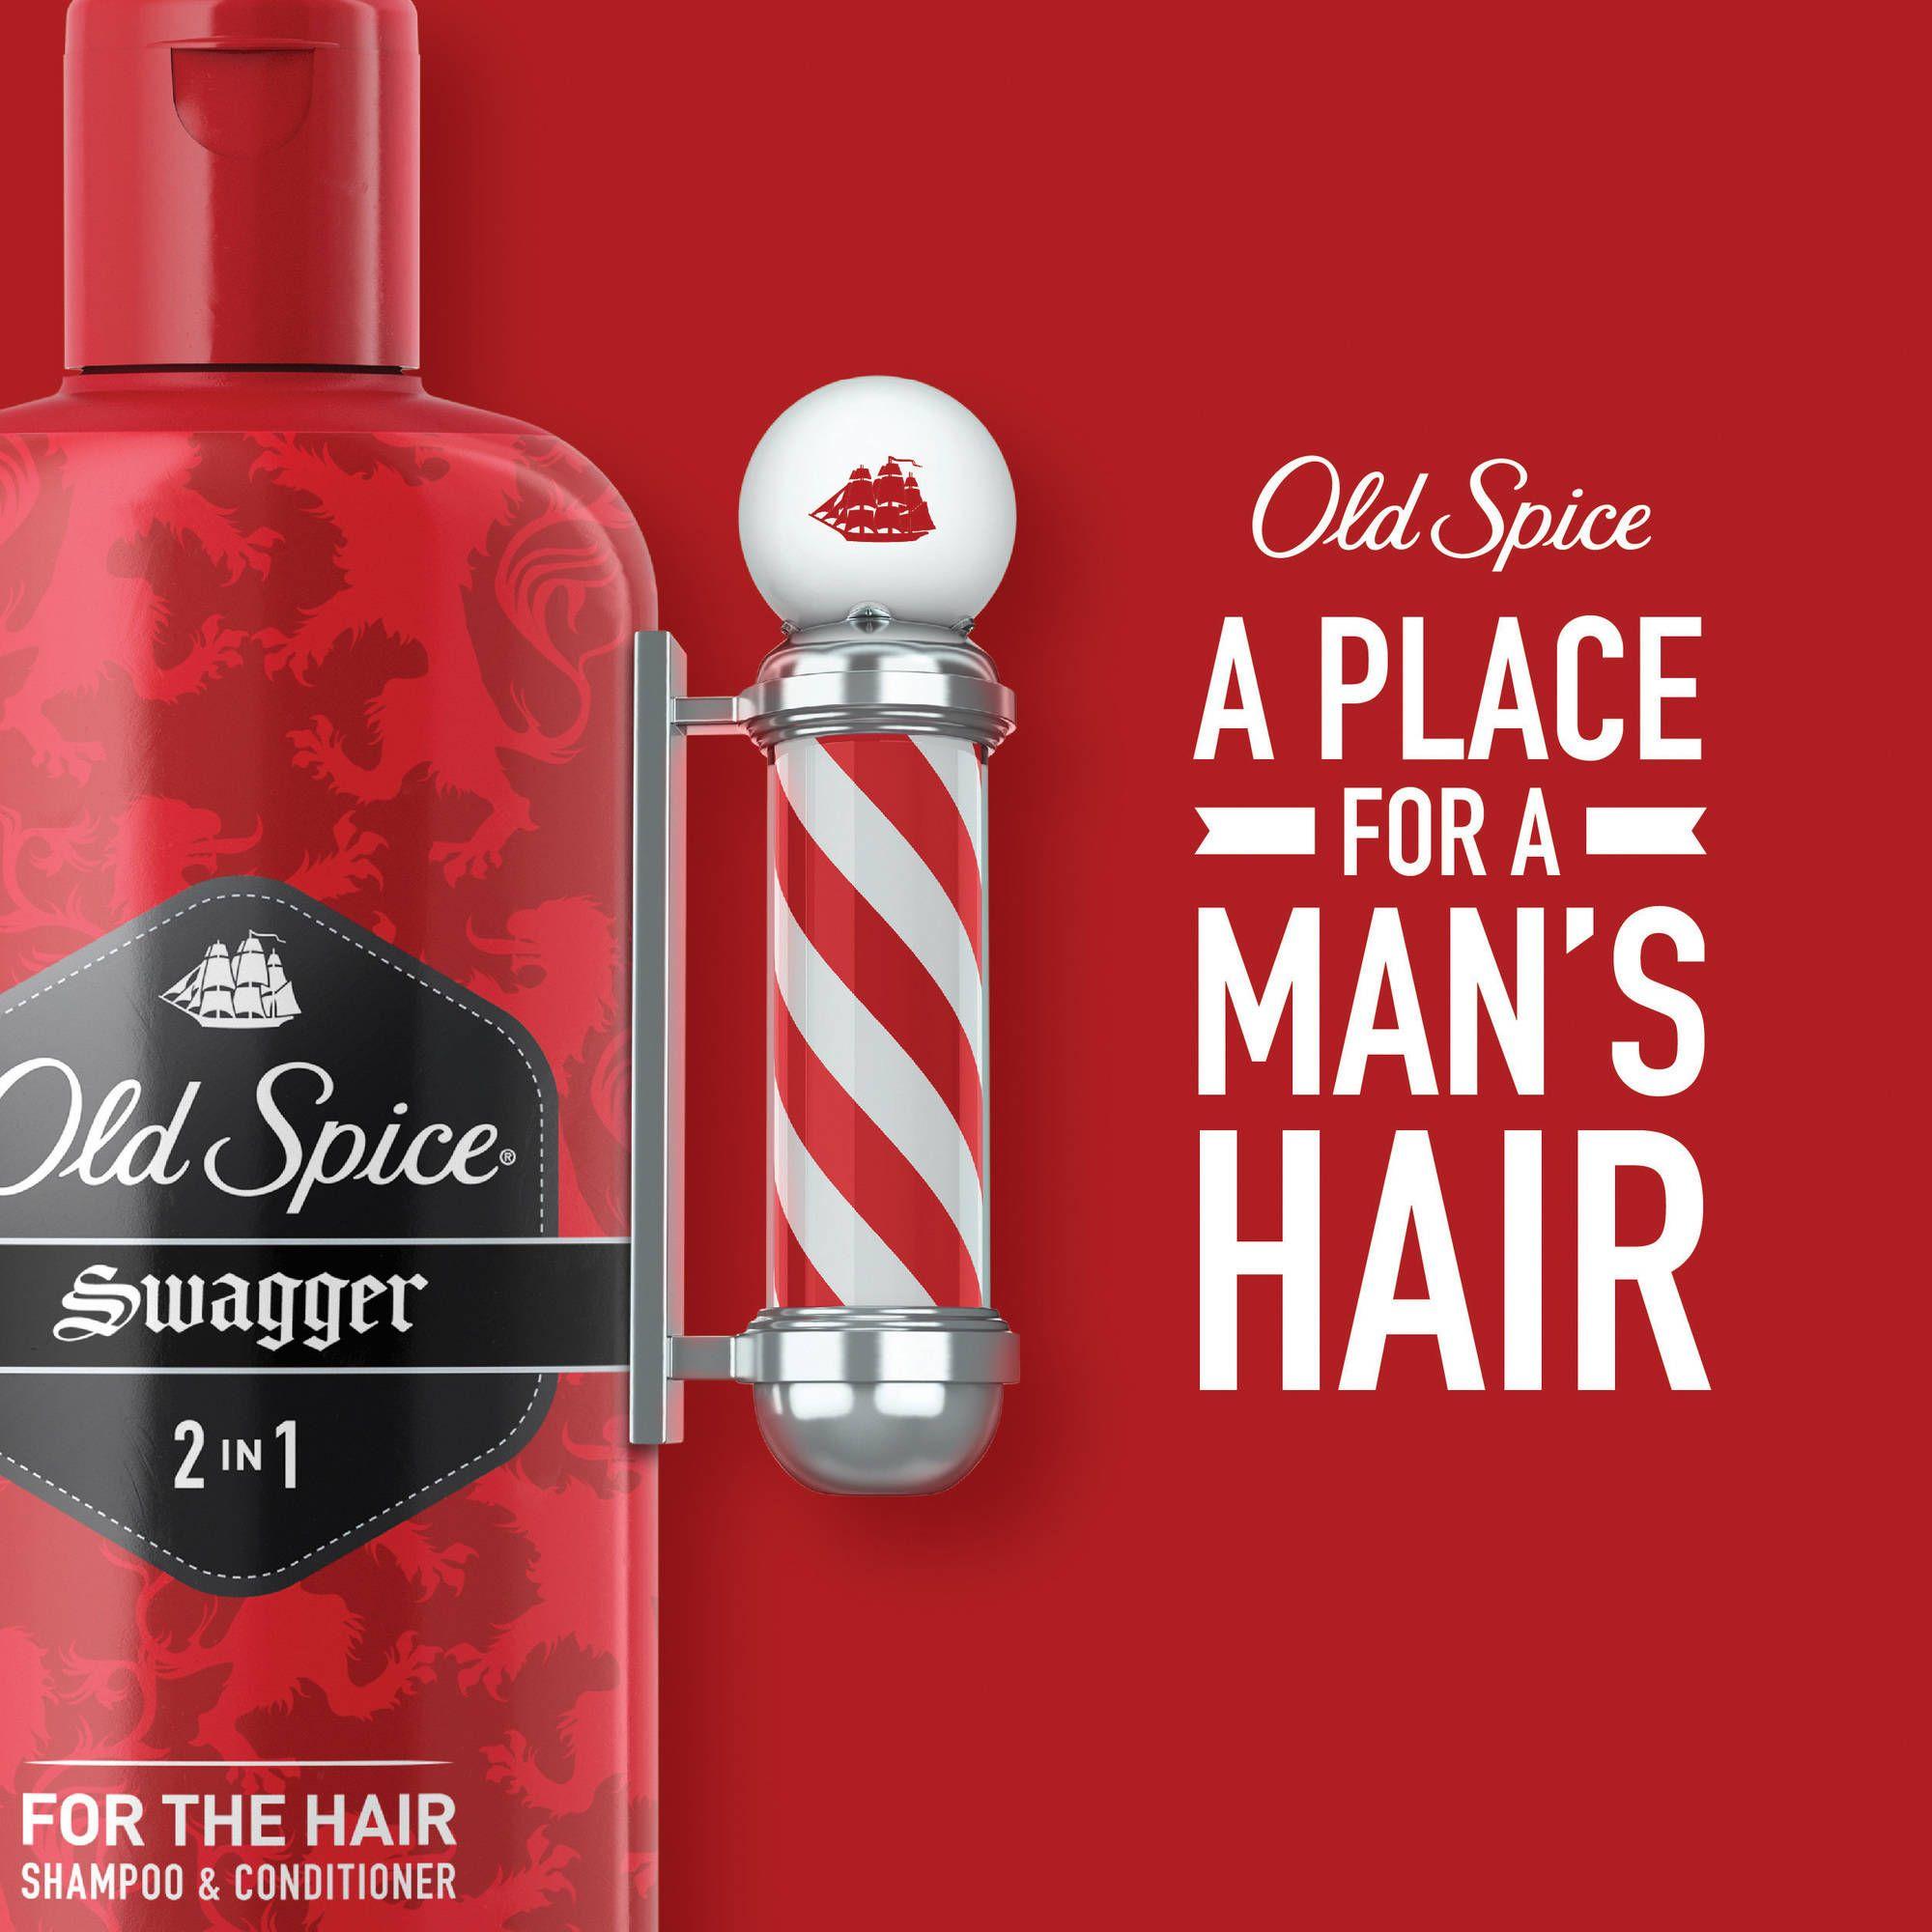 Old Spice Pomade 2 64 Oz Hair Styling For Men Pomade Spice Oz